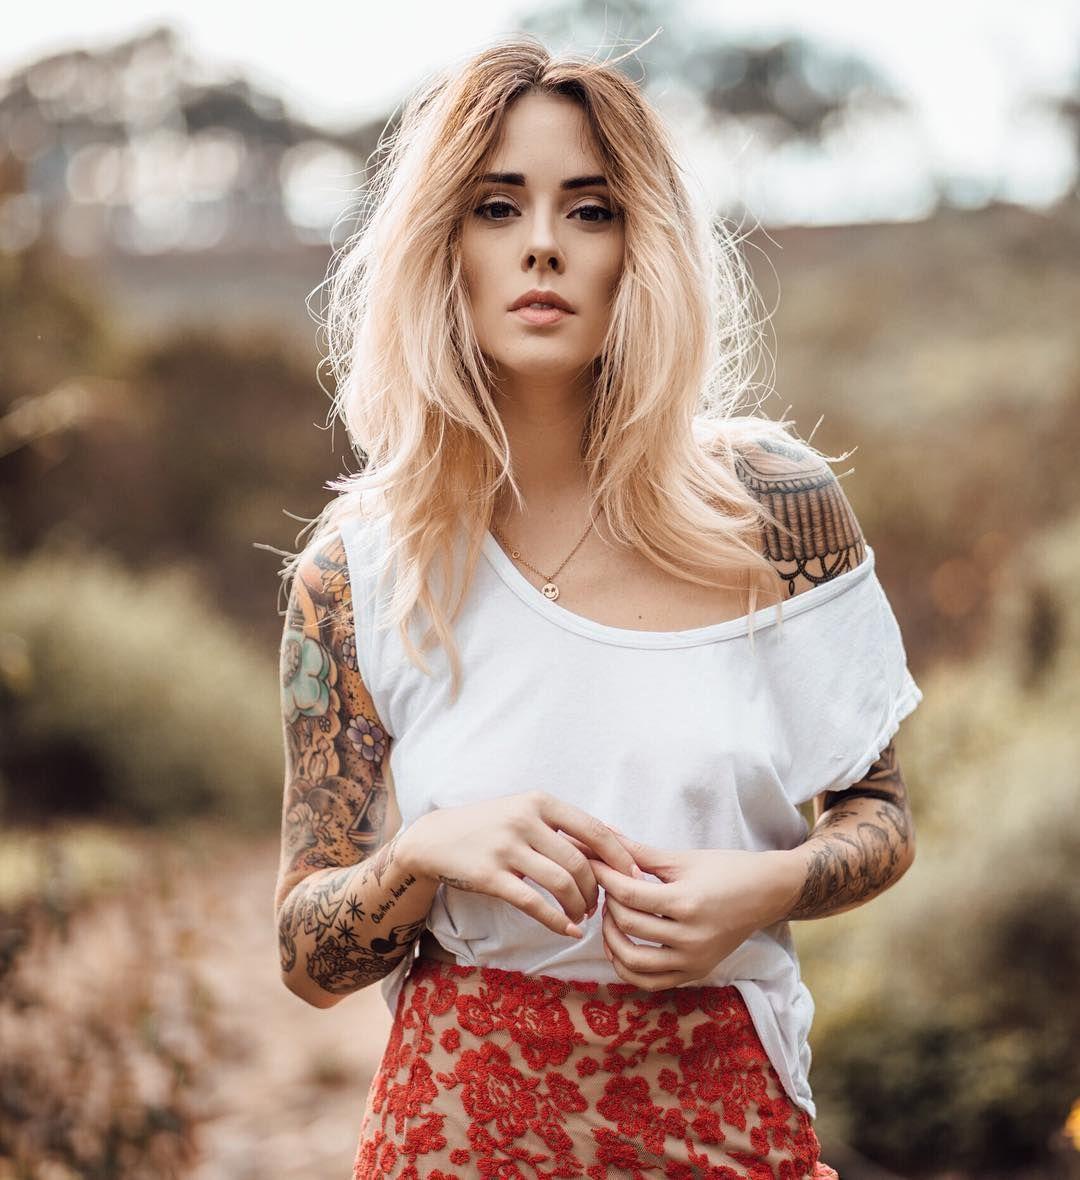 Instagram Kati Garnett nudes (49 photos), Pussy, Is a cute, Boobs, underwear 2019